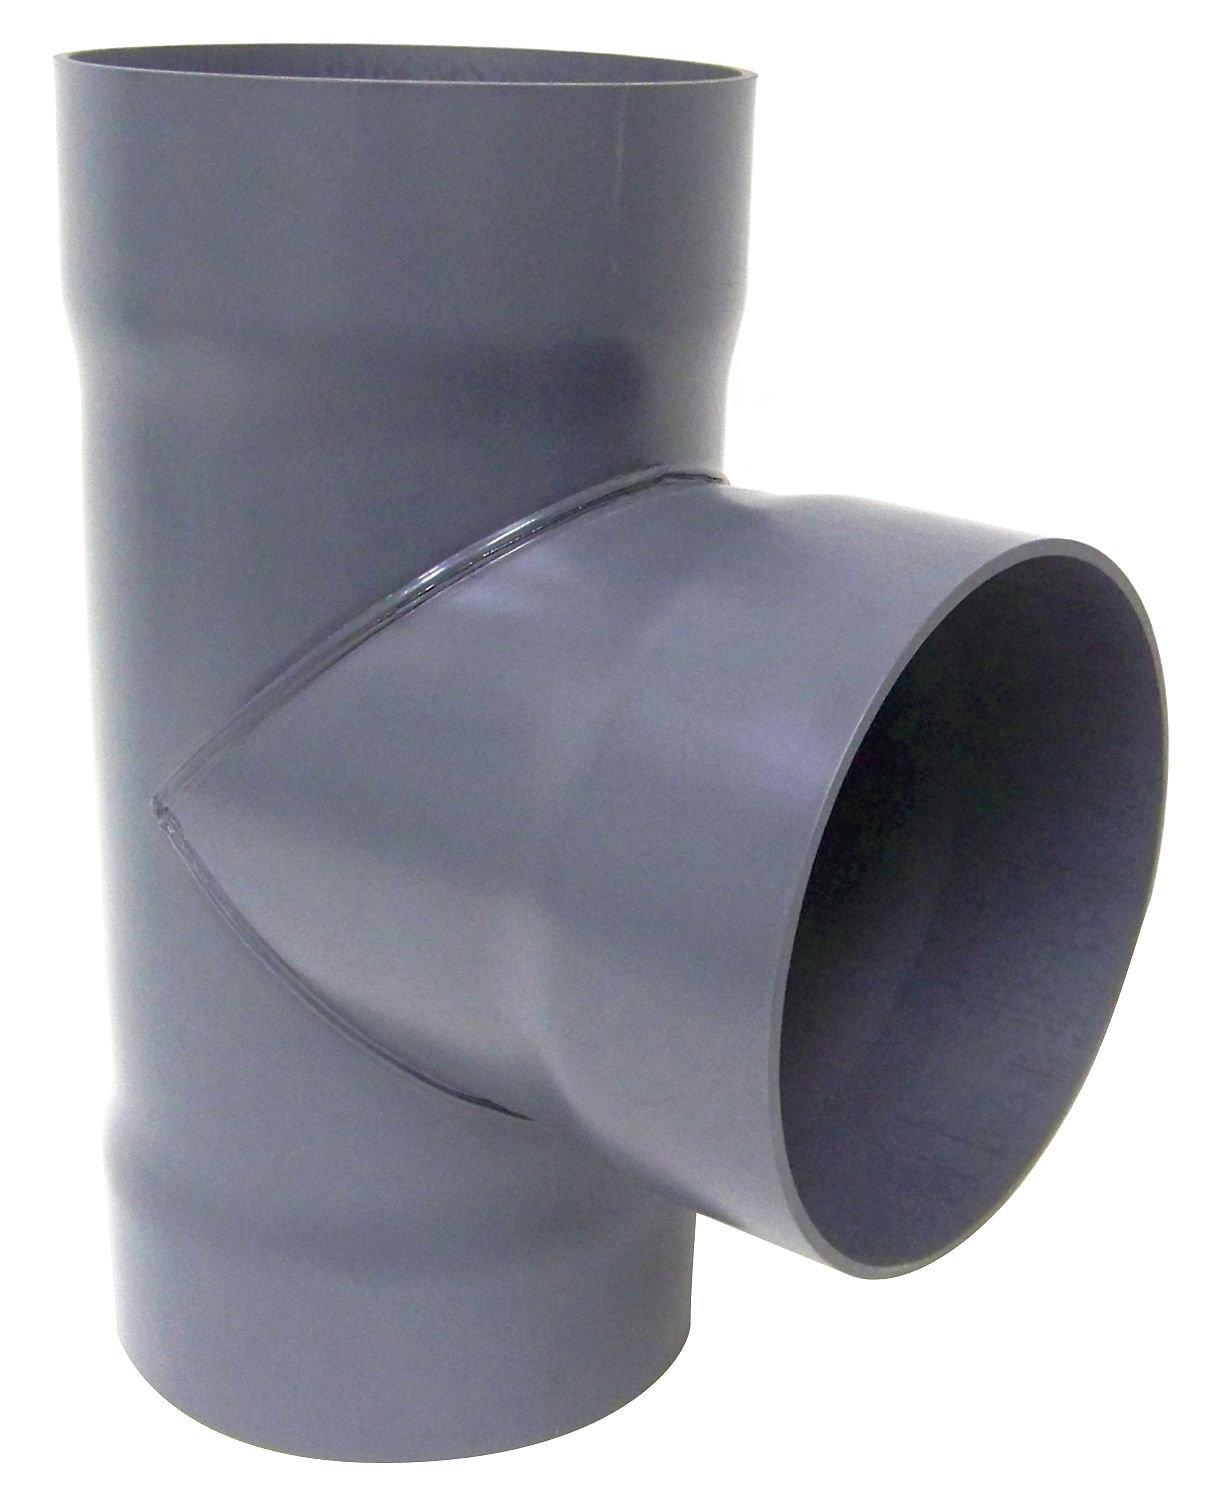 All Material Handling CB015-00-00 Badger Manual Chain Hoist No Chain 00/' Lift 00/' Drop ALM   CB015-00-00 00 Lift 1.5 Ton 00 Drop